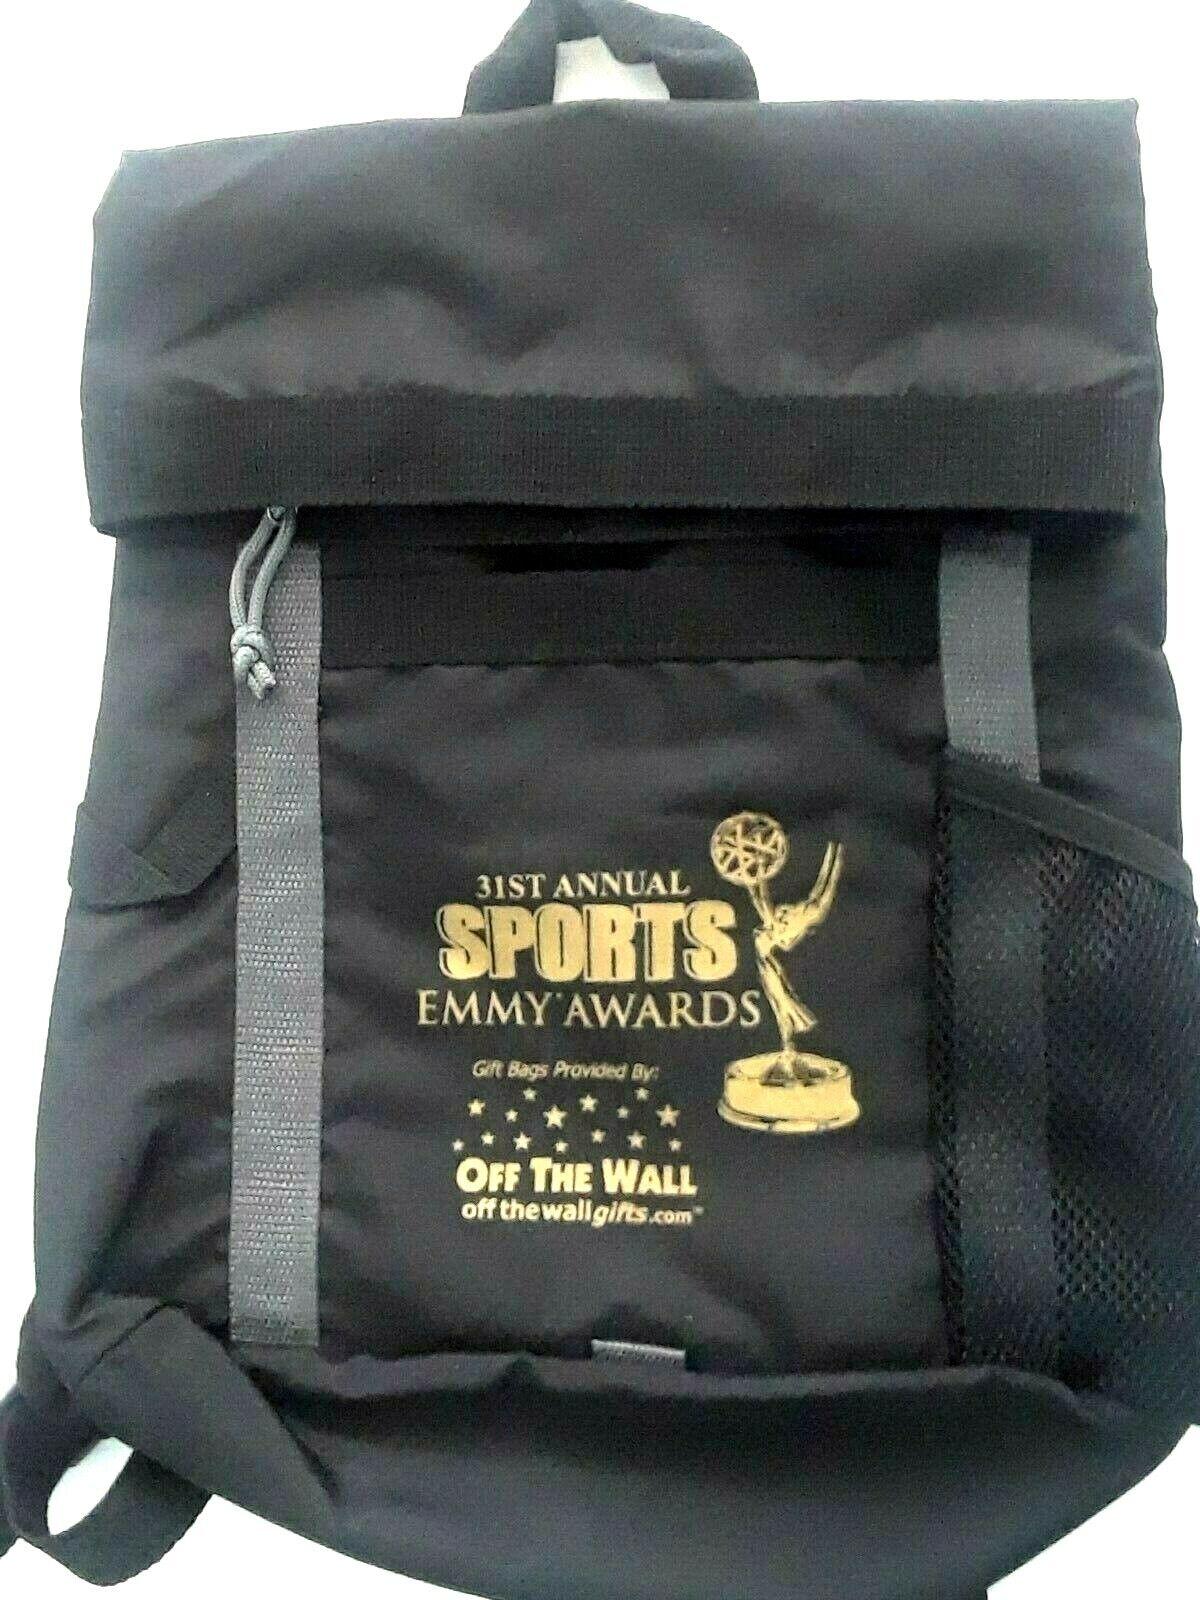 Rare 31st annual sports emmy awards(2009 season) backpack